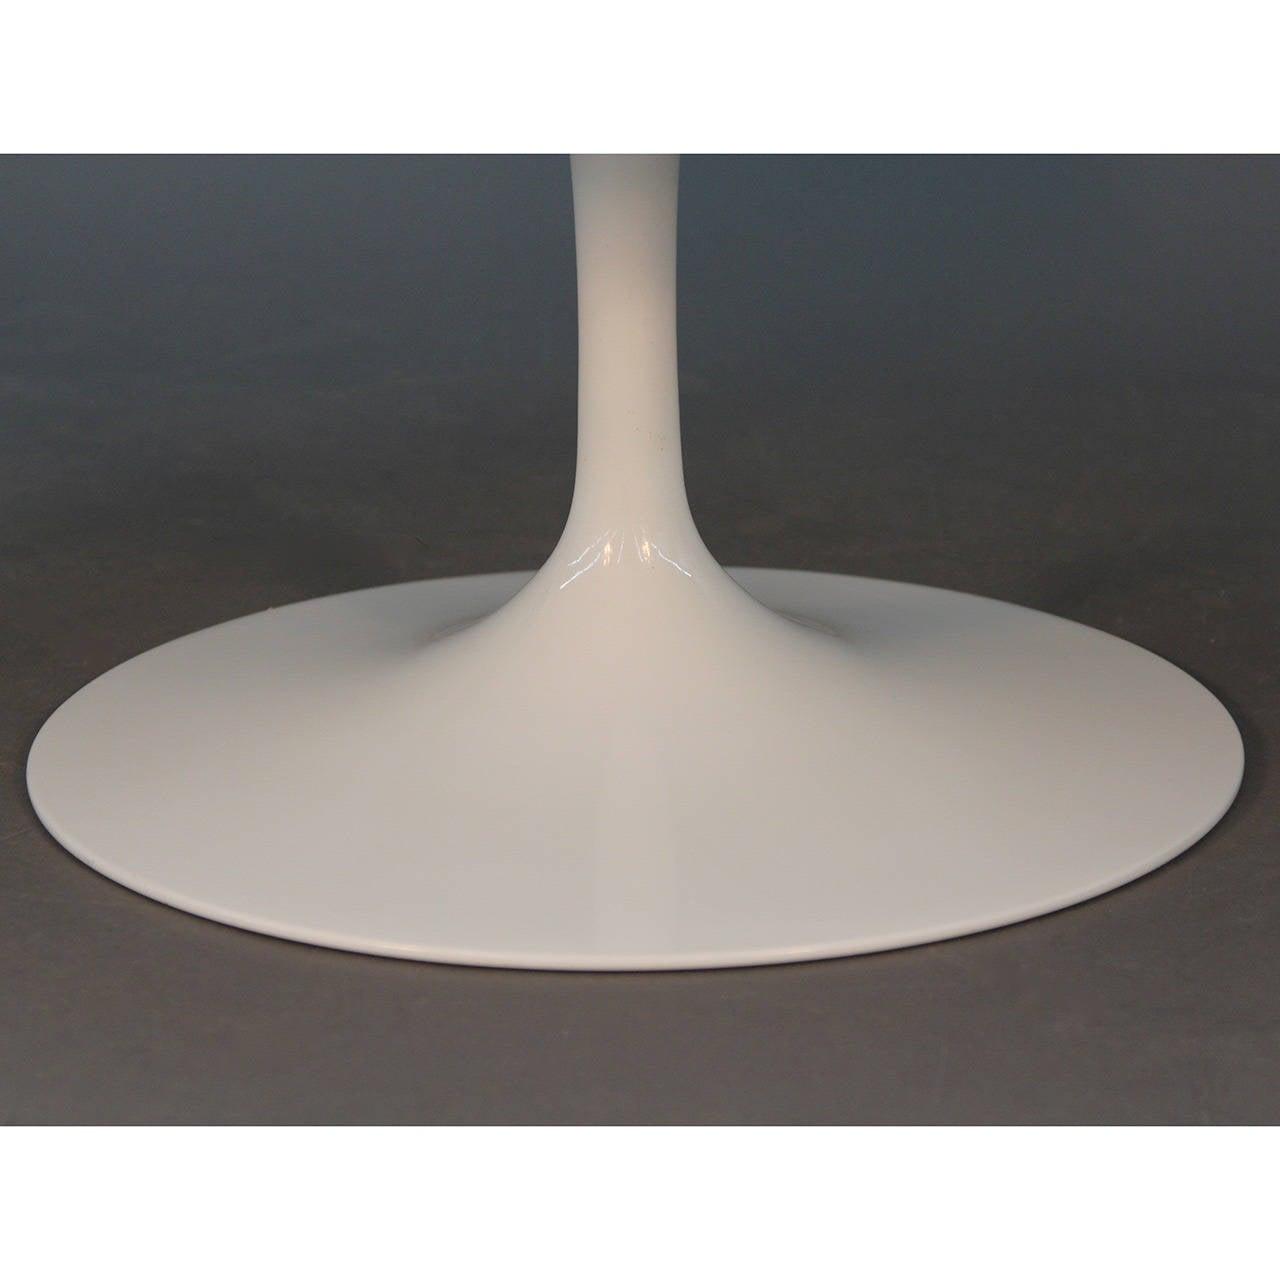 Saarinen Tulip Coffee Table Tulip Coffee Table Image 4